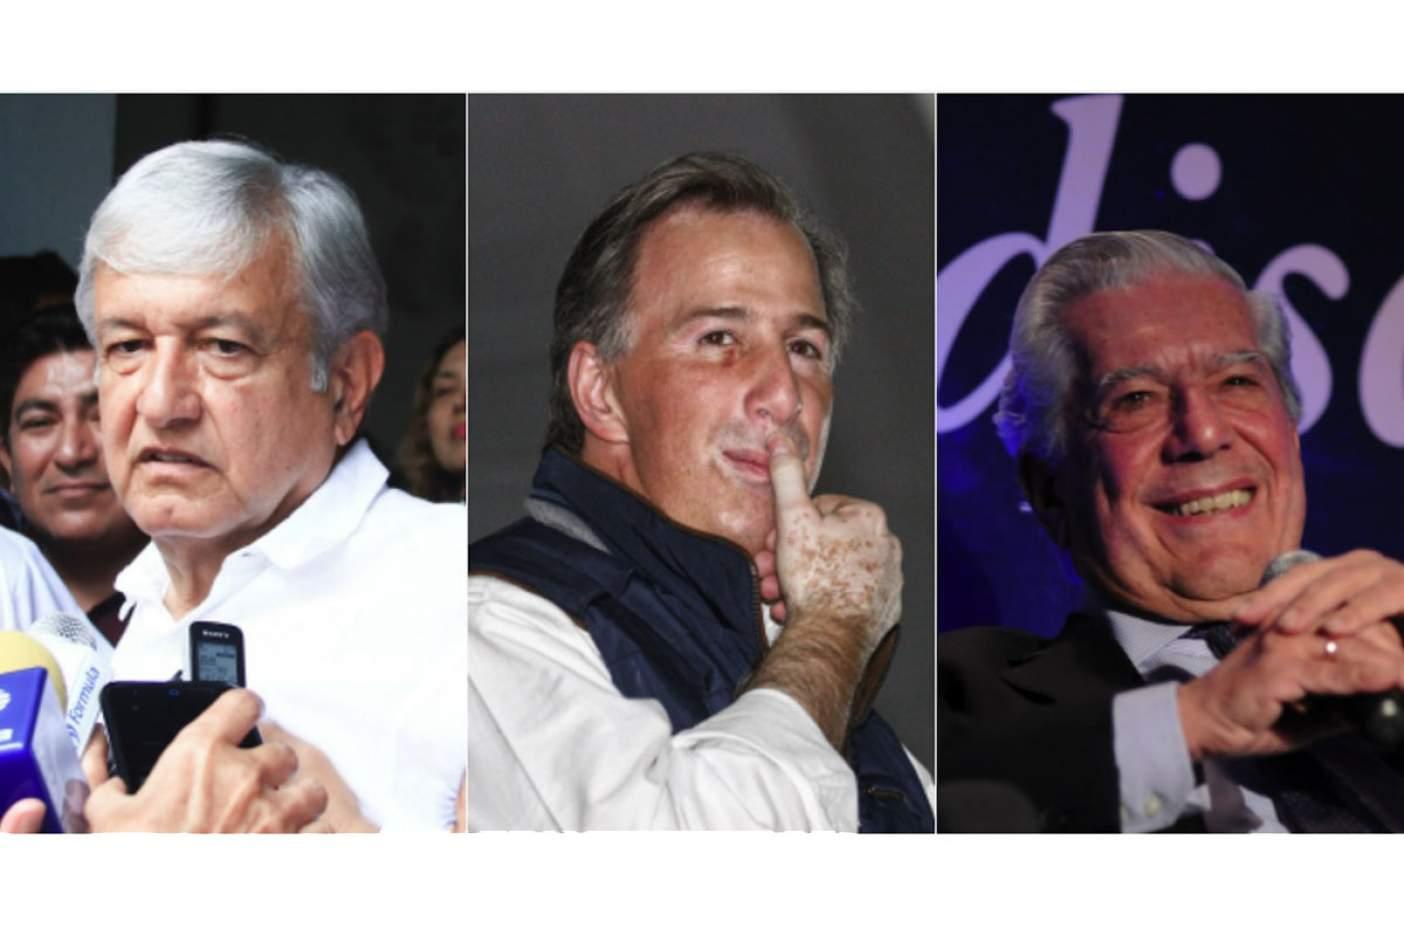 Propone historiadora quema de libros de Vargas Llosa porque criticó a AMLO